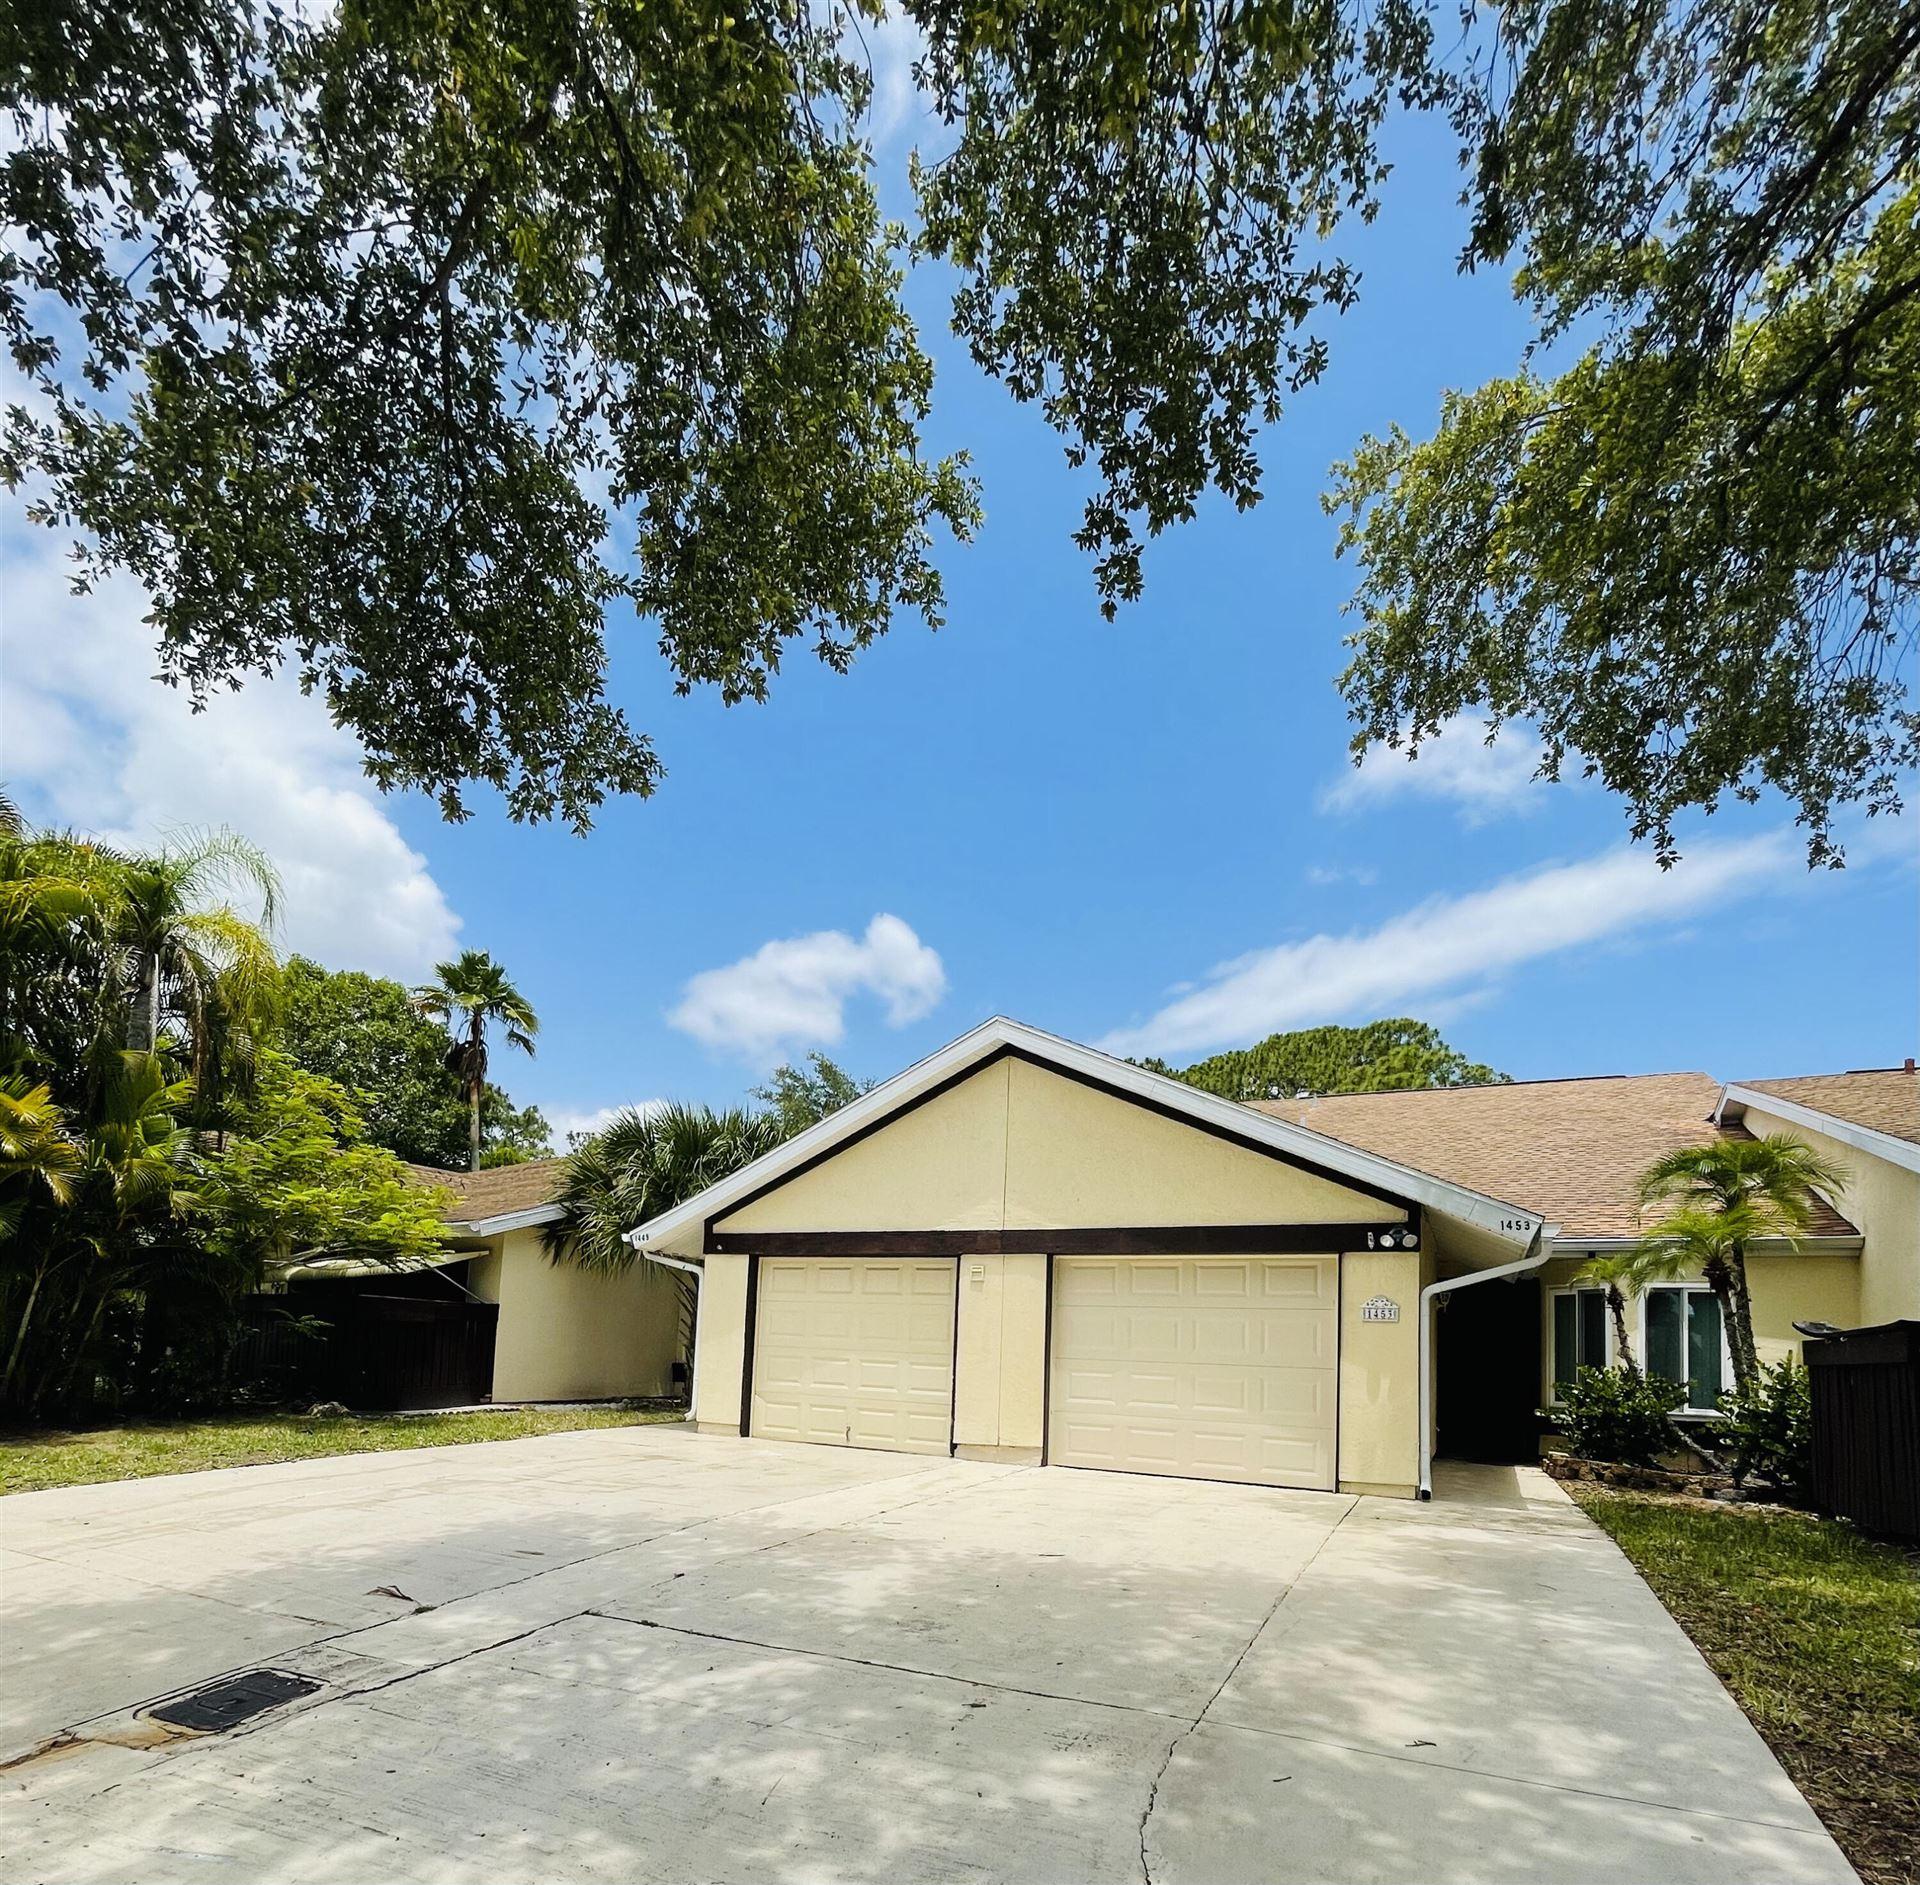 1449 SE Rivergreen Circle, Port Saint Lucie, FL 34952 - #: RX-10718227